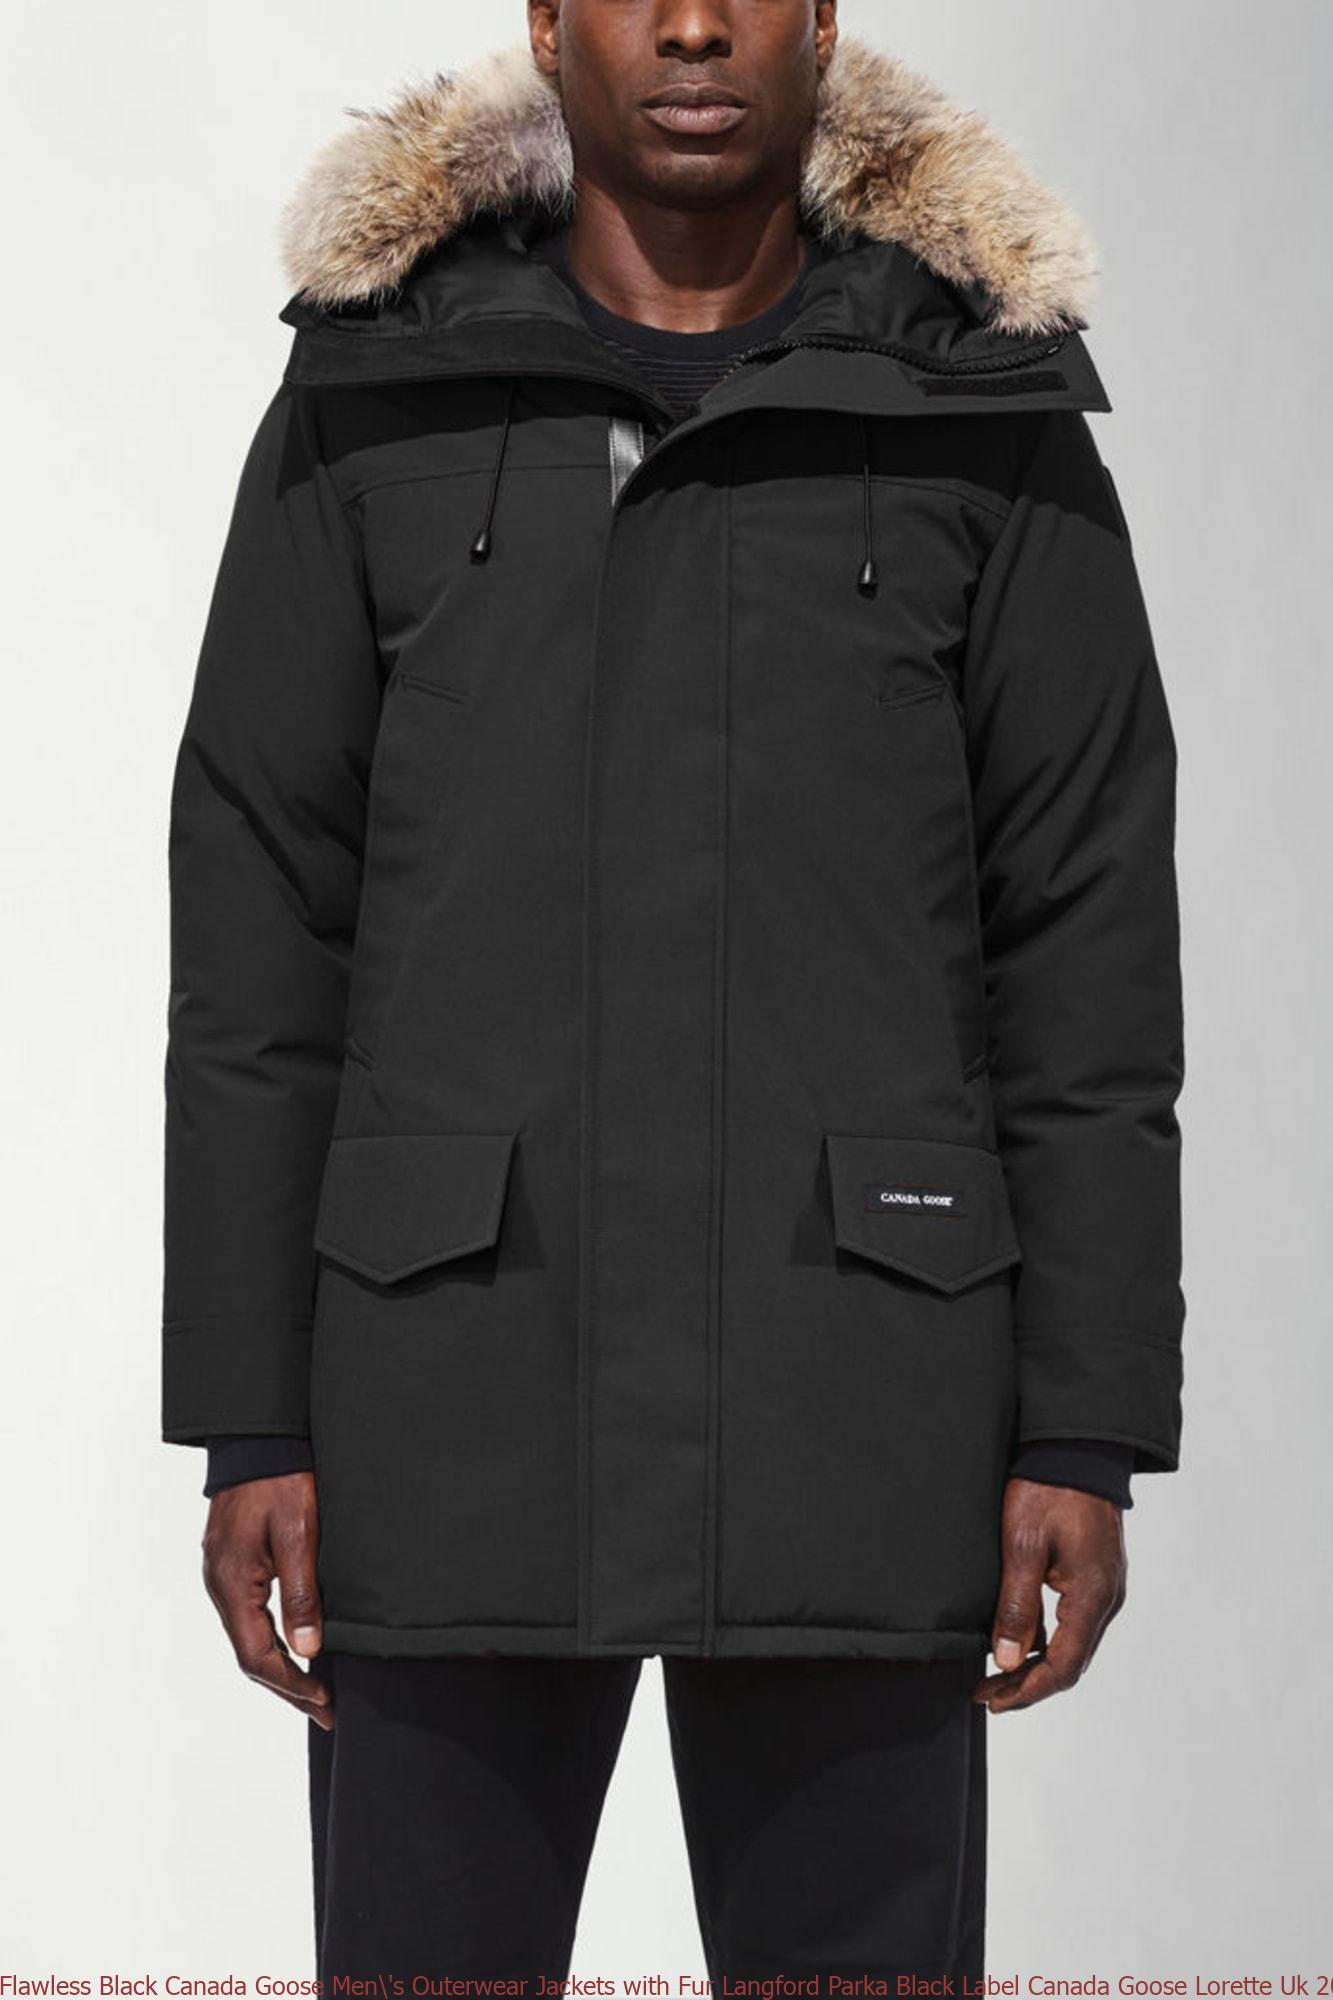 Flawless Black Canada Goose Men's Outerwear Jackets with Fur Langford Parka Black Label Canada Goose Lorette Uk 2062MB